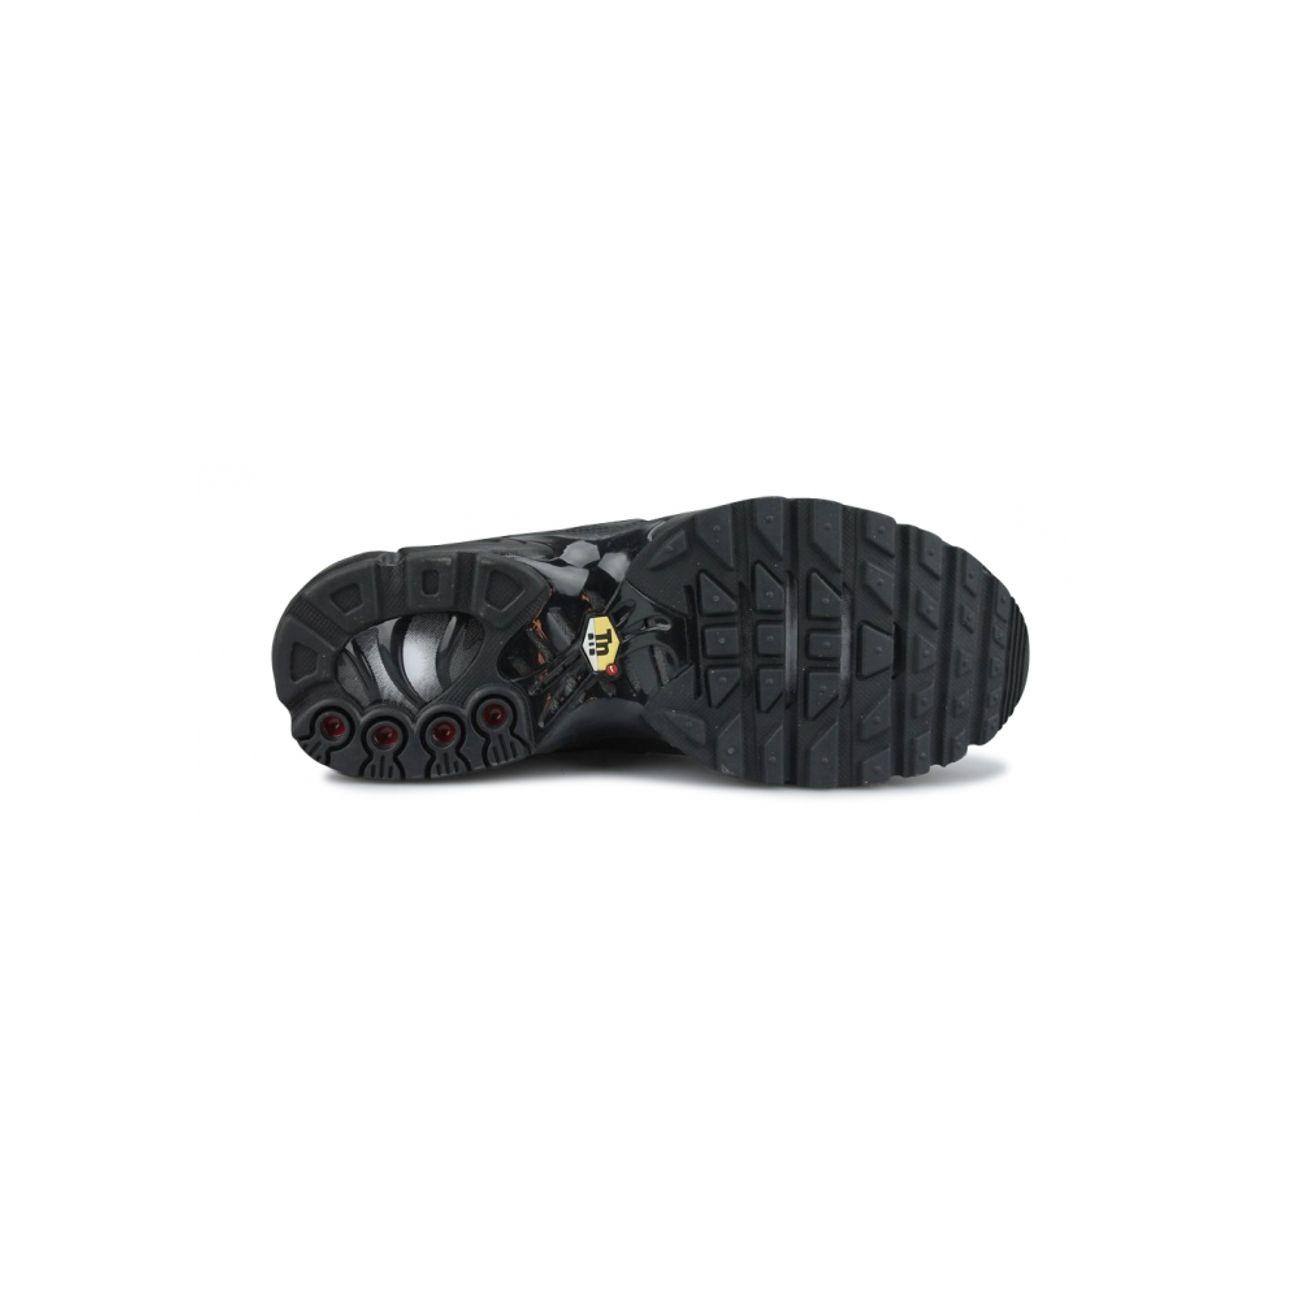 innovative design 47346 b47fb ... Mode- Lifestyle garçon NIKE Basket Nike Air Max Plus Tn Tuned Junior  Noir 655020- ...